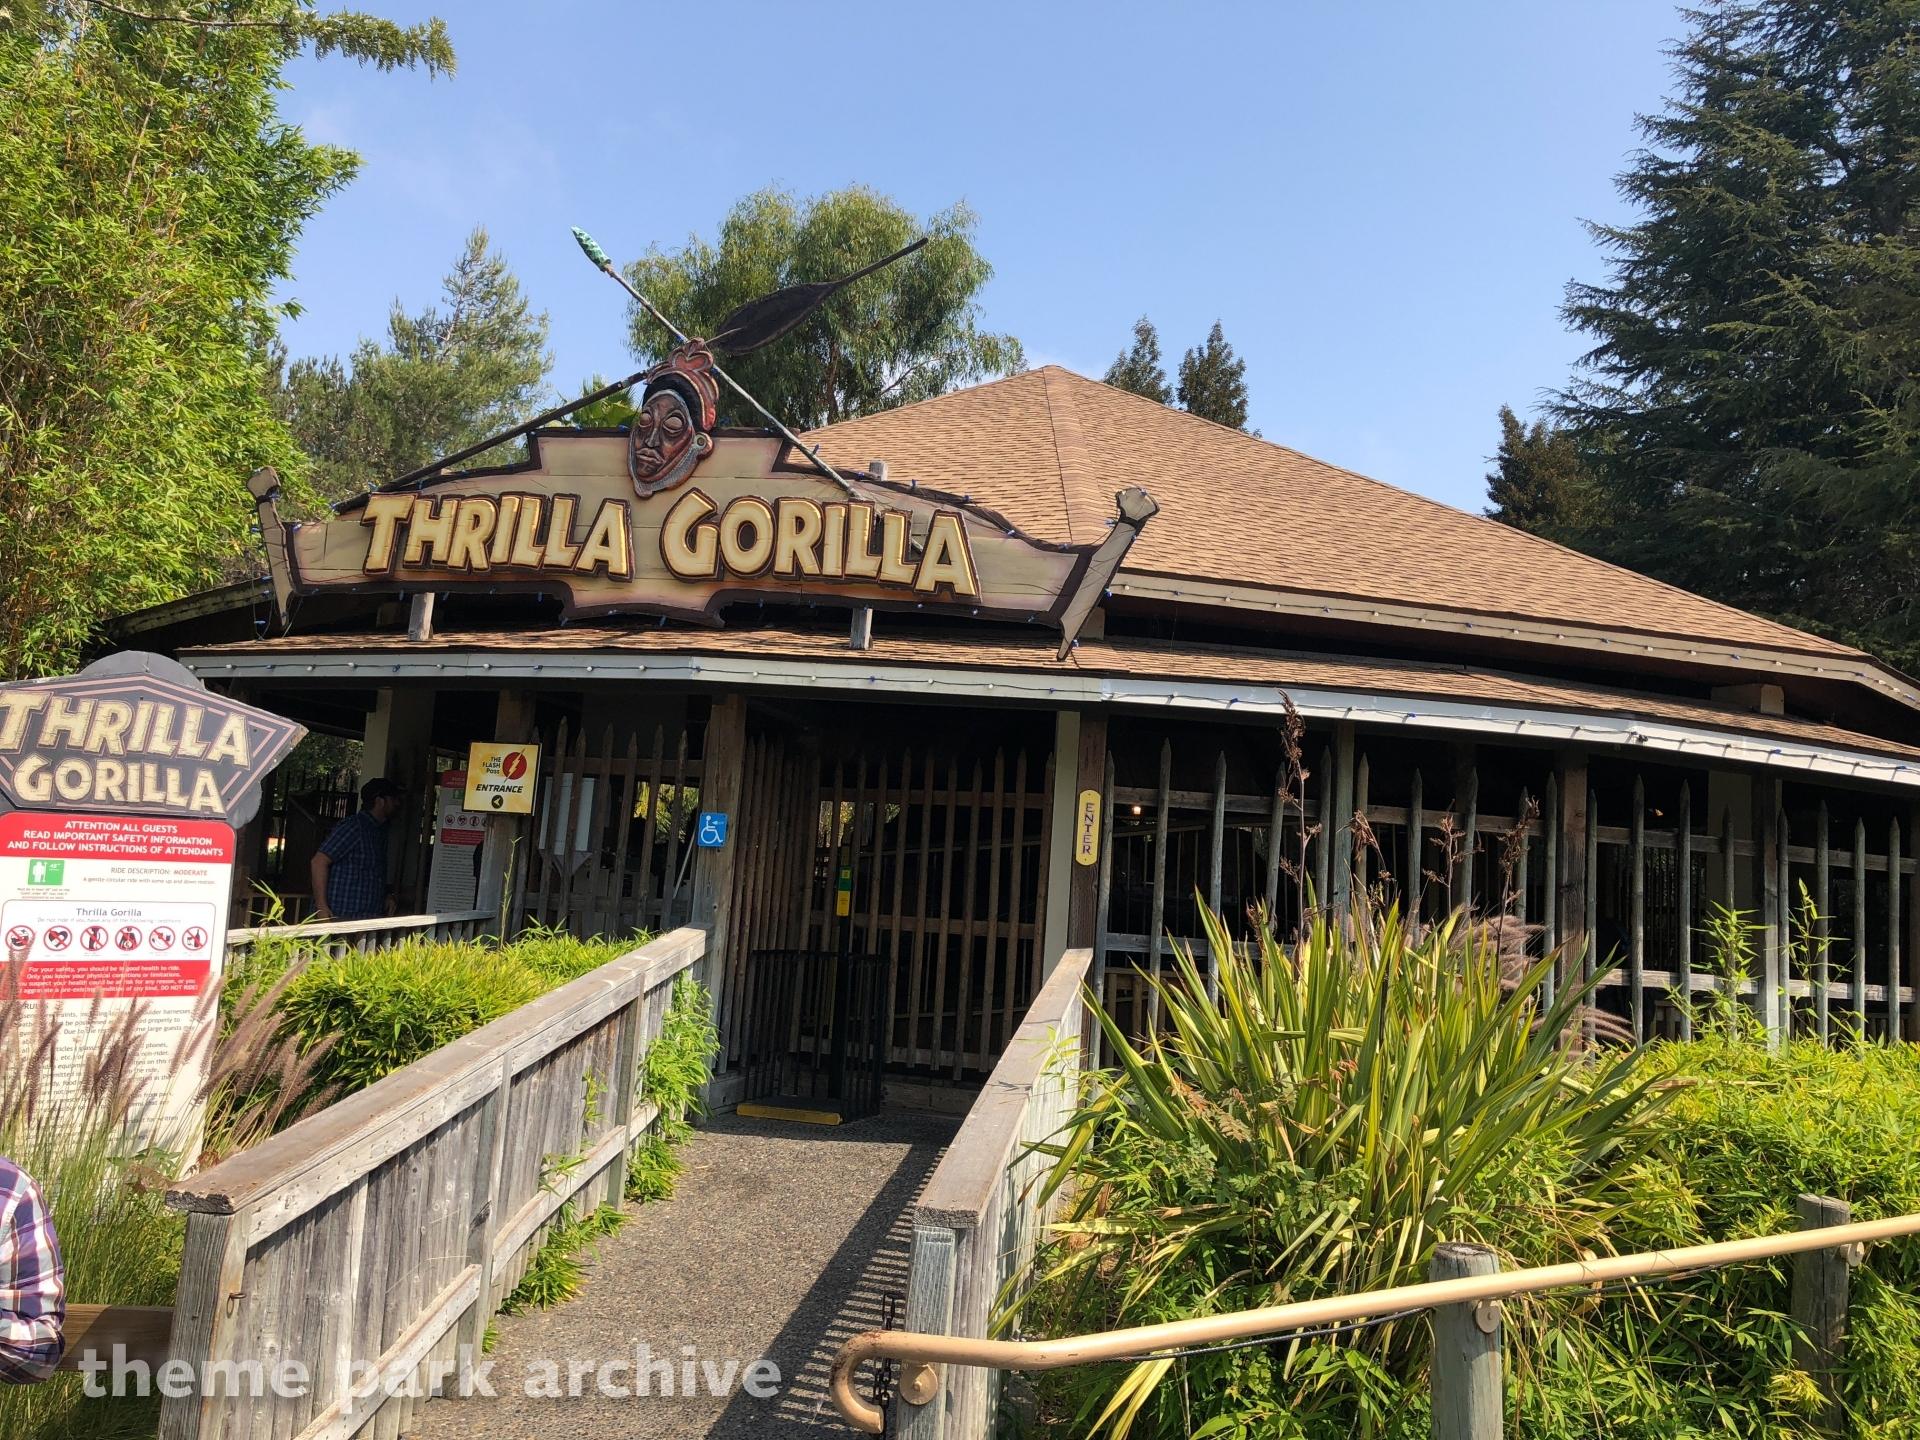 Thrilla Gorilla at Six Flags Discovery Kingdom